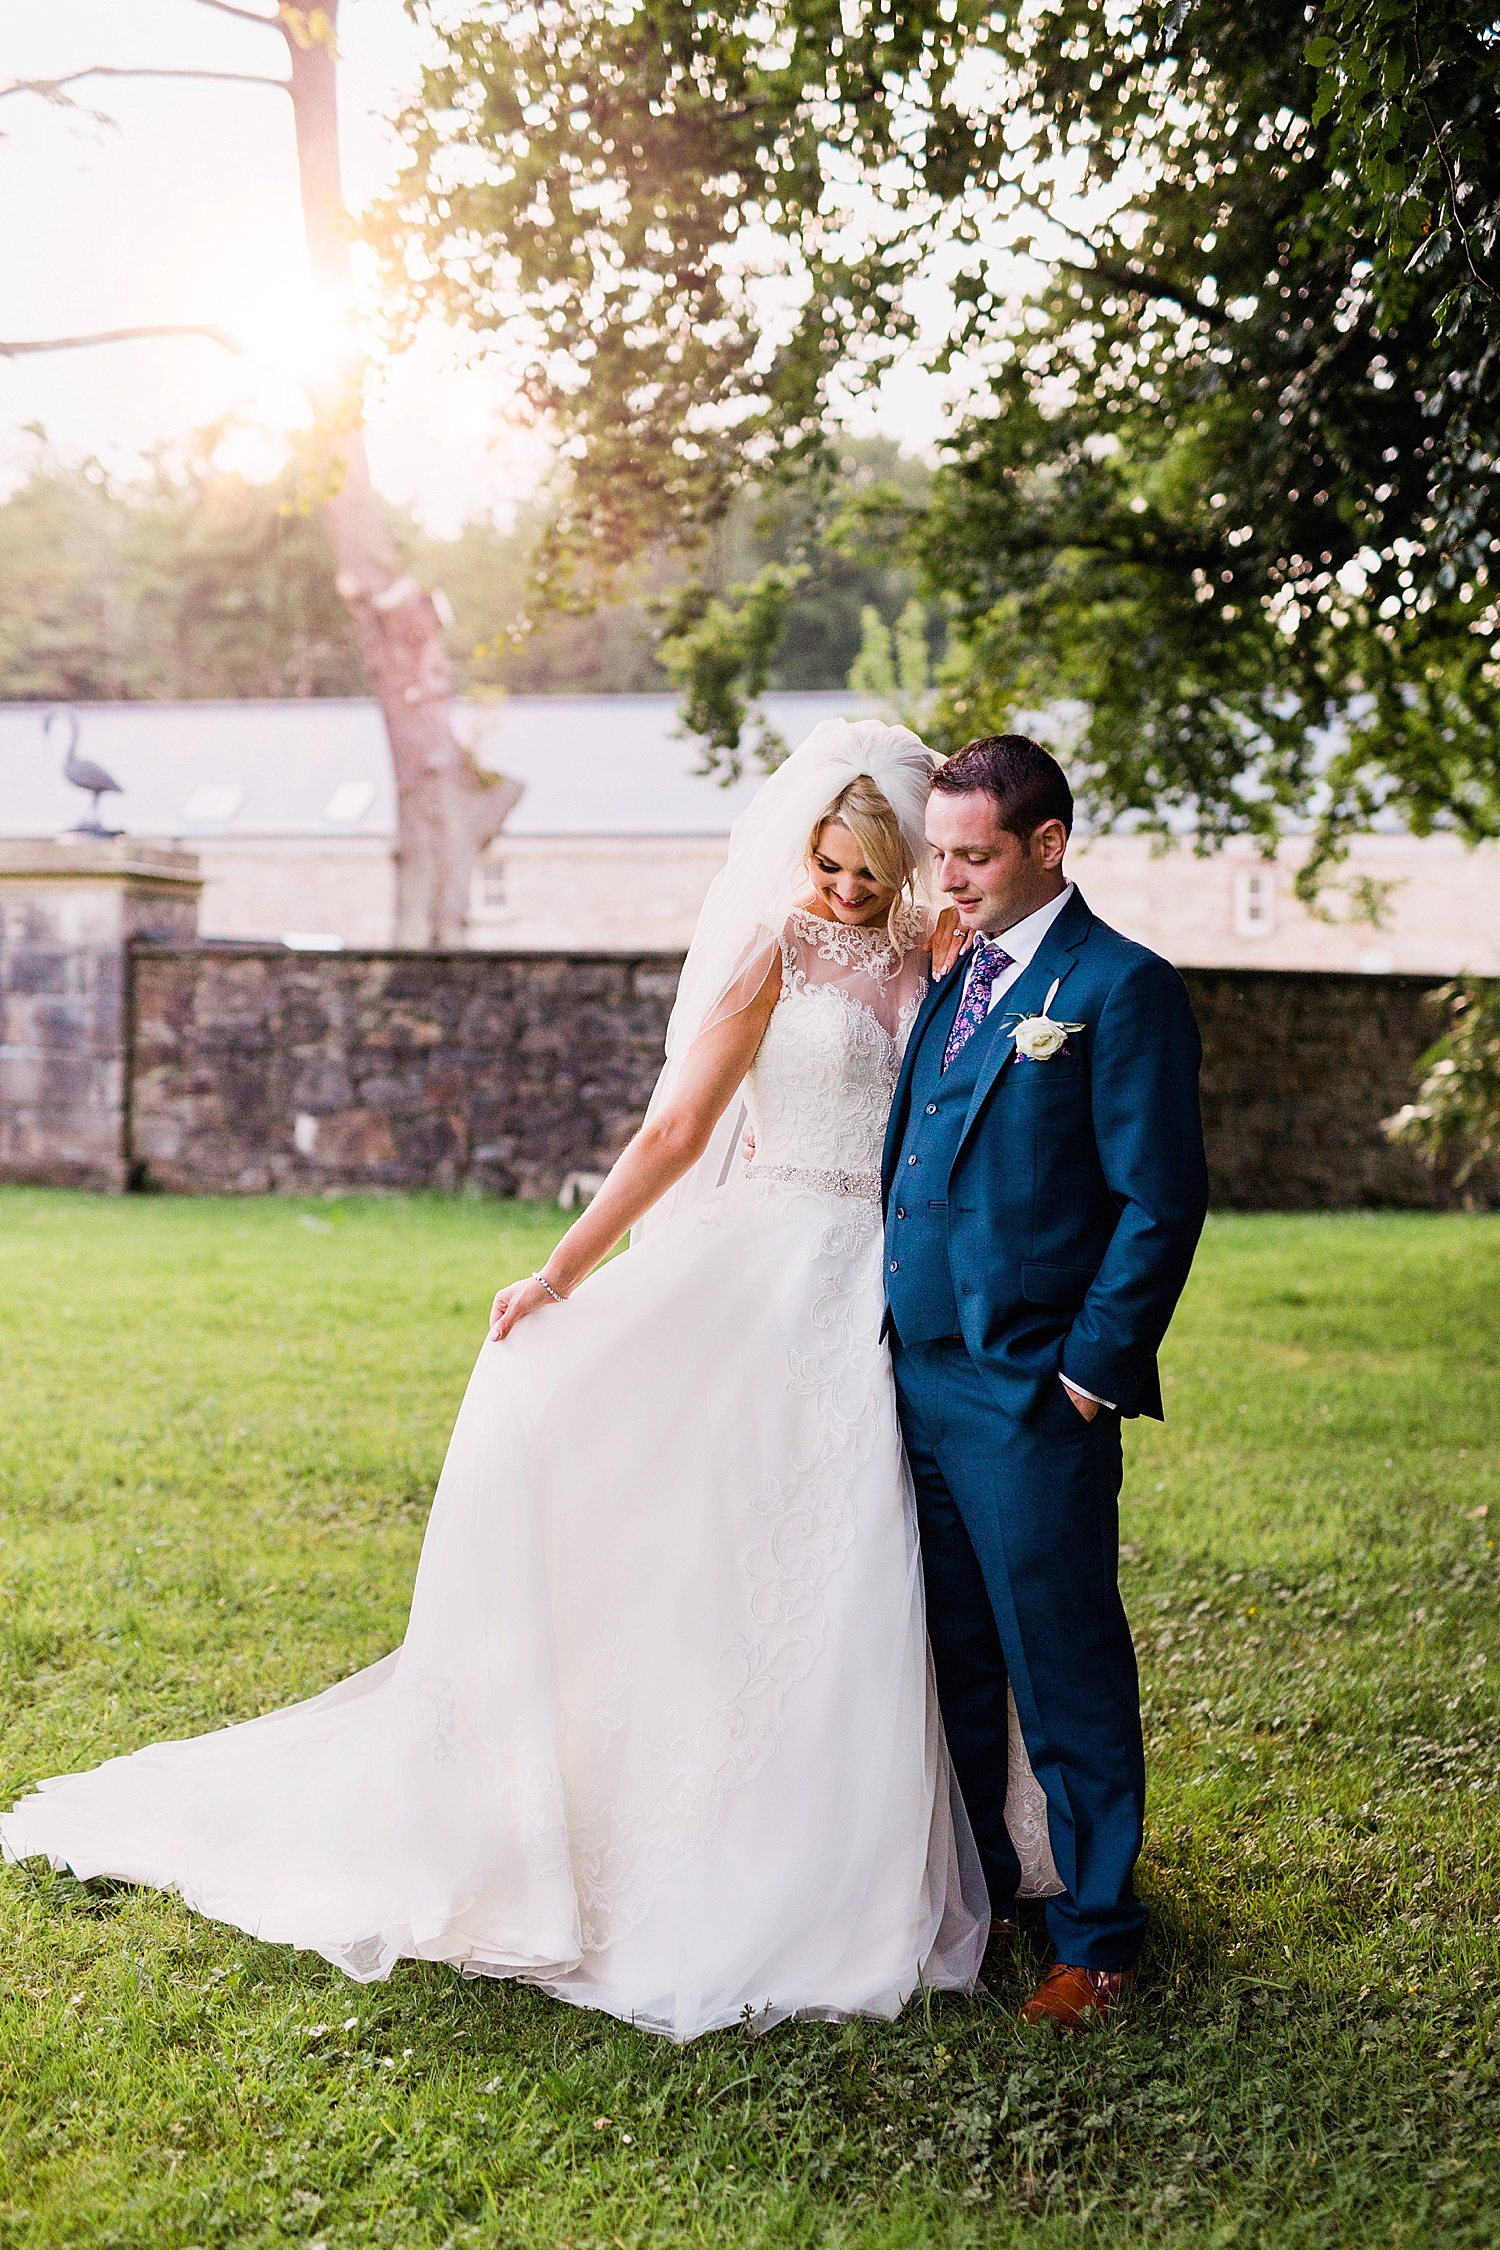 donegal_weddingfermanagh_wedding_photographer-ashford_castle_wedding-best_of_2016_sharon_kee_photography_0206